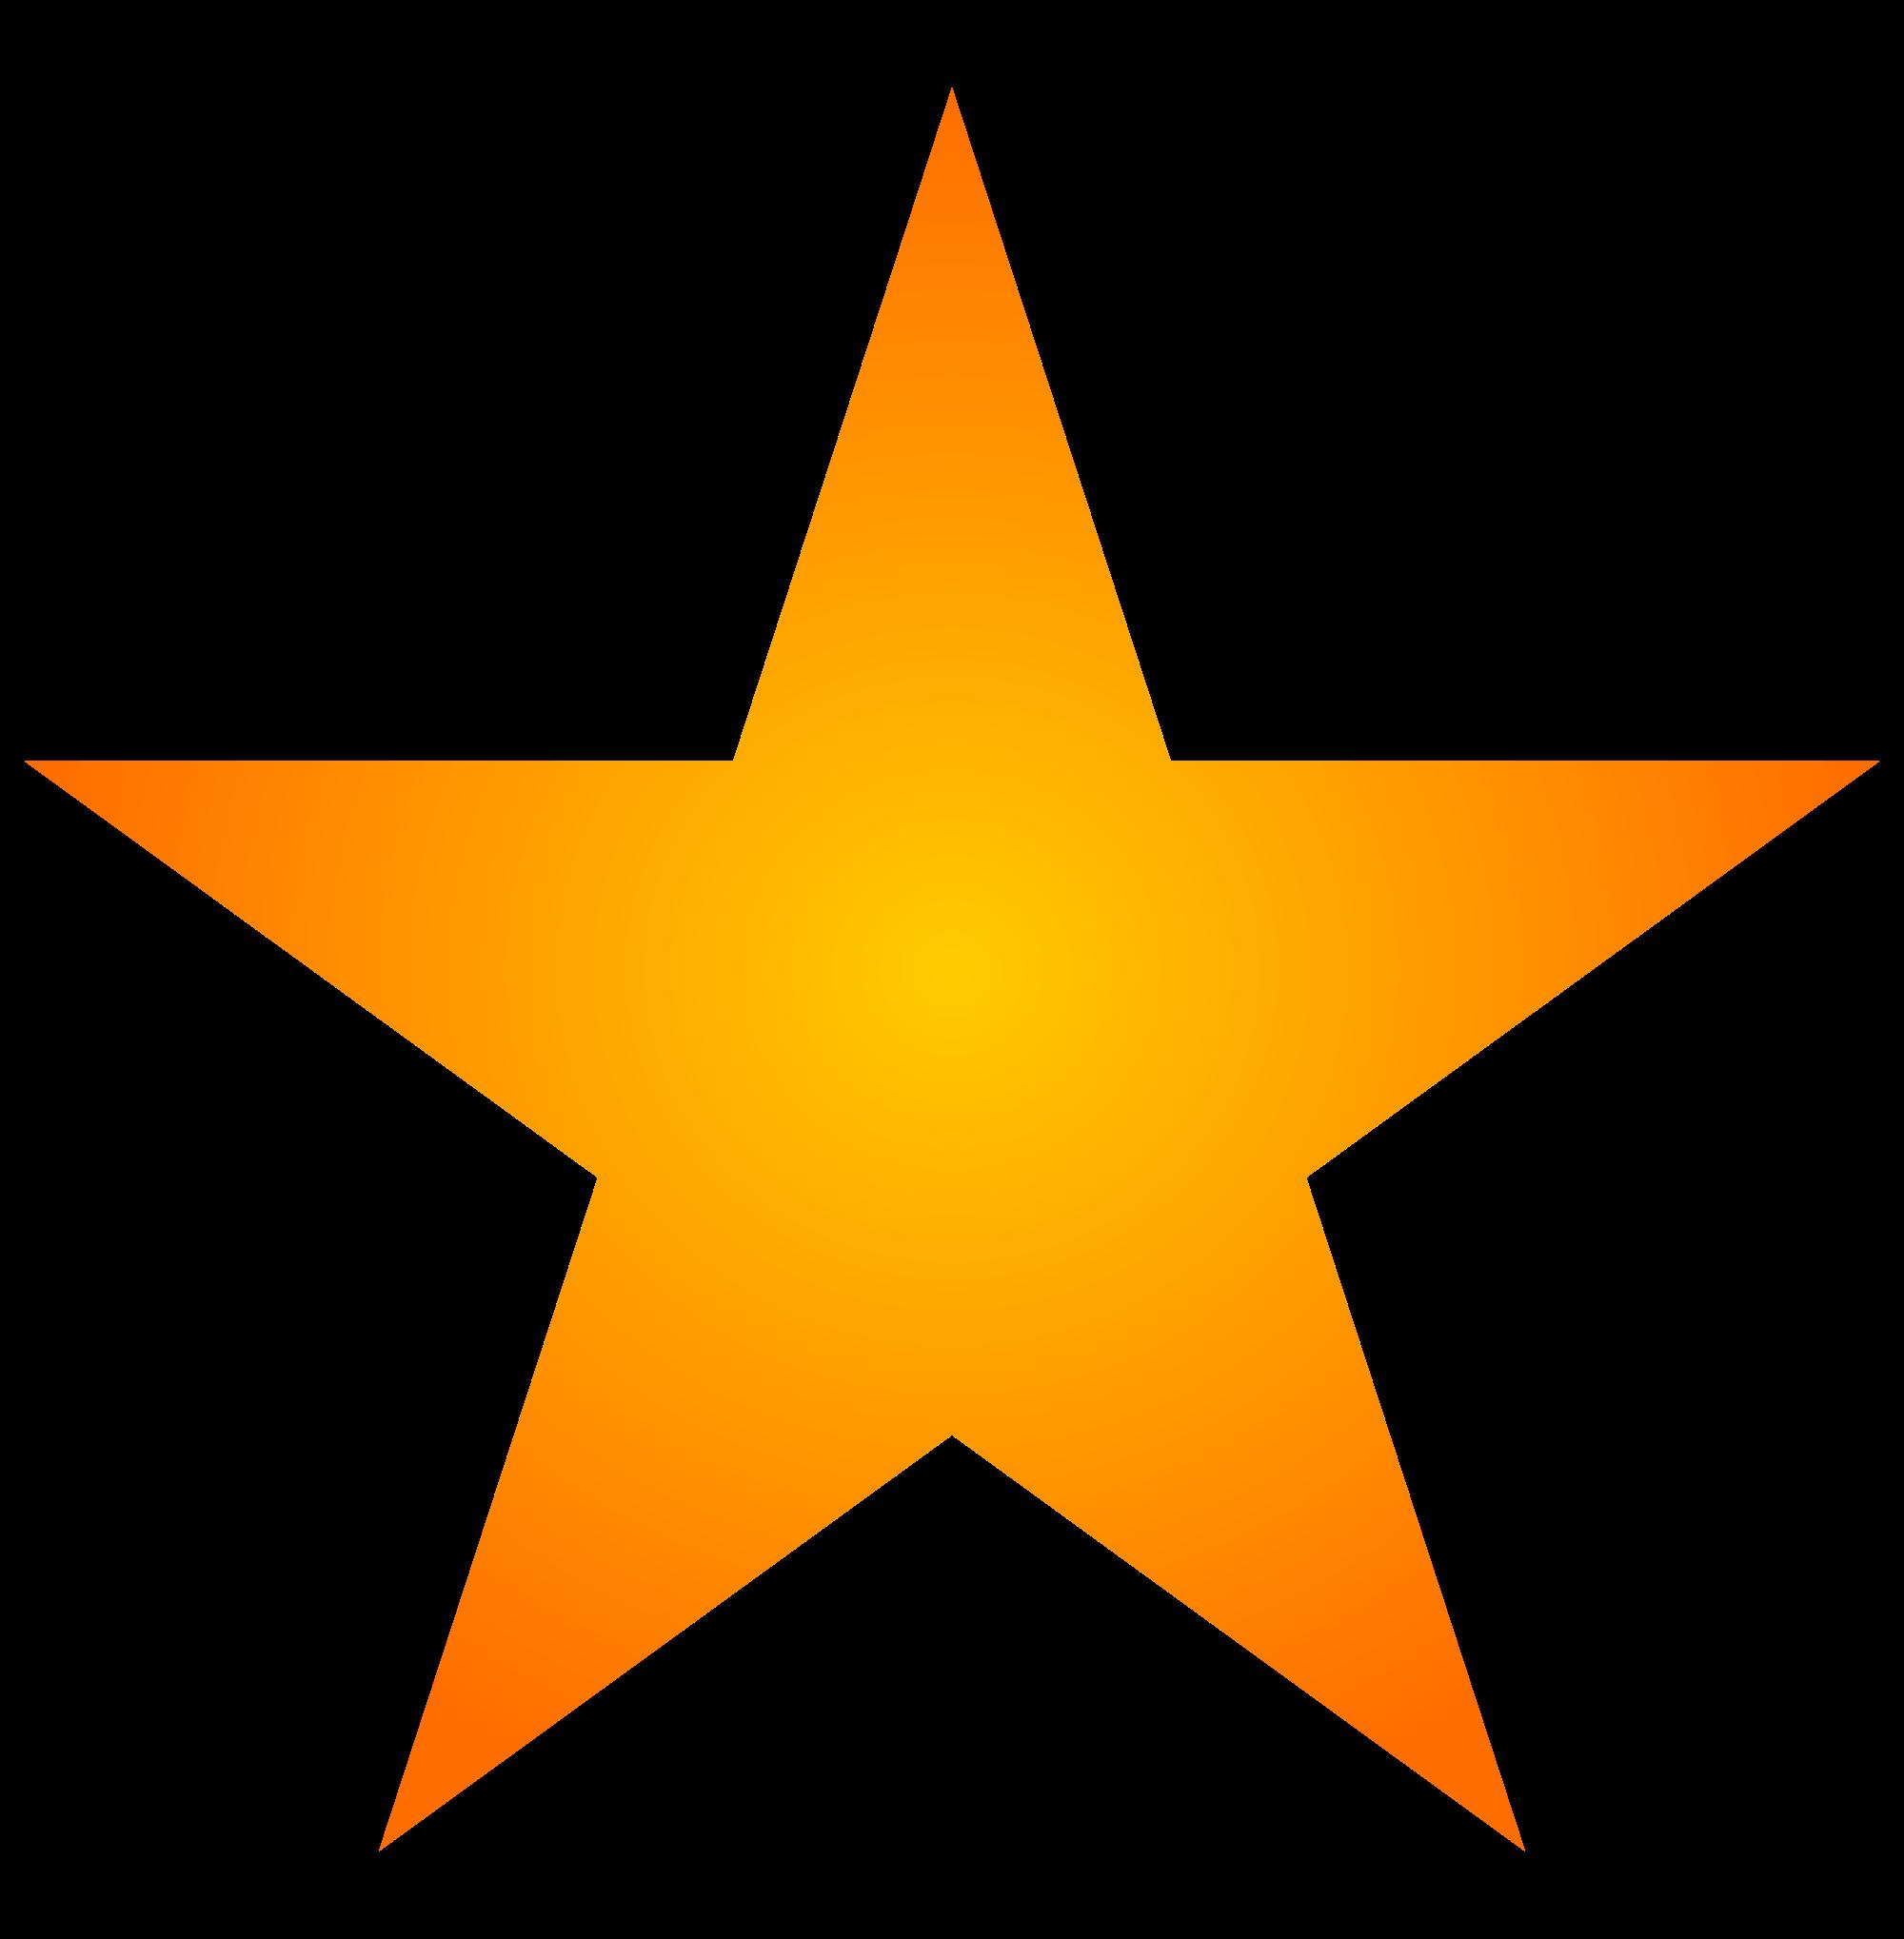 2000x2037 Stars Images